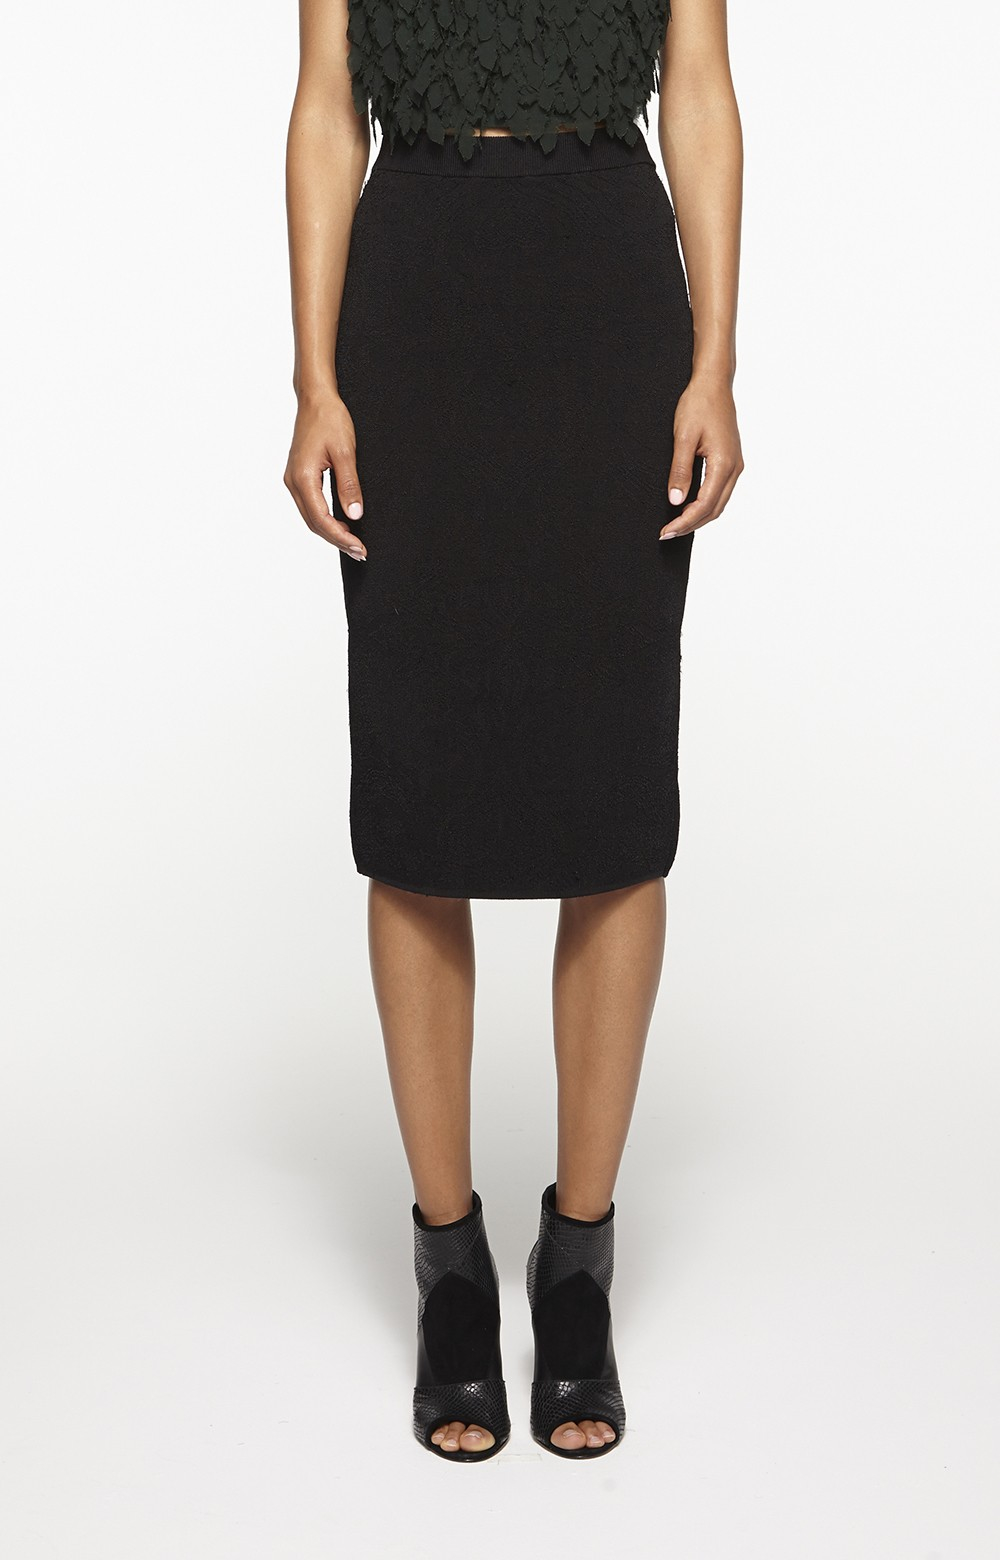 Nicole miller Knit Pencil Skirt in Black | Lyst